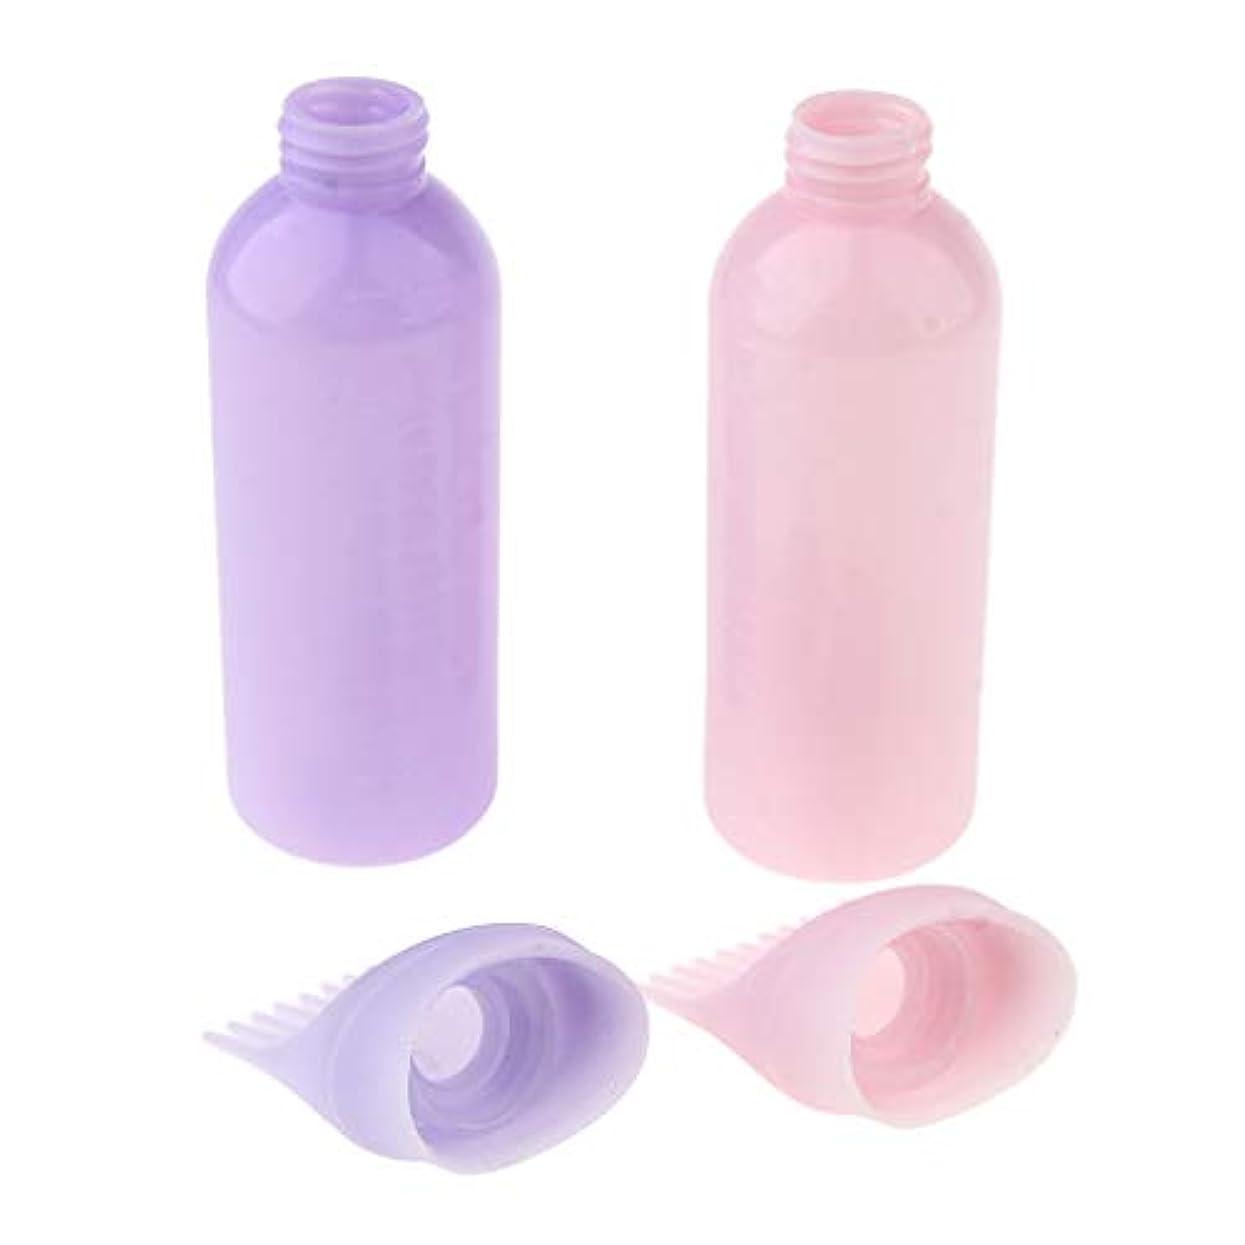 CUTICATE 全2点 プラスチック製 着色ボトル 瓶 ヘアカラーリング用品 ヘアダイブラシ